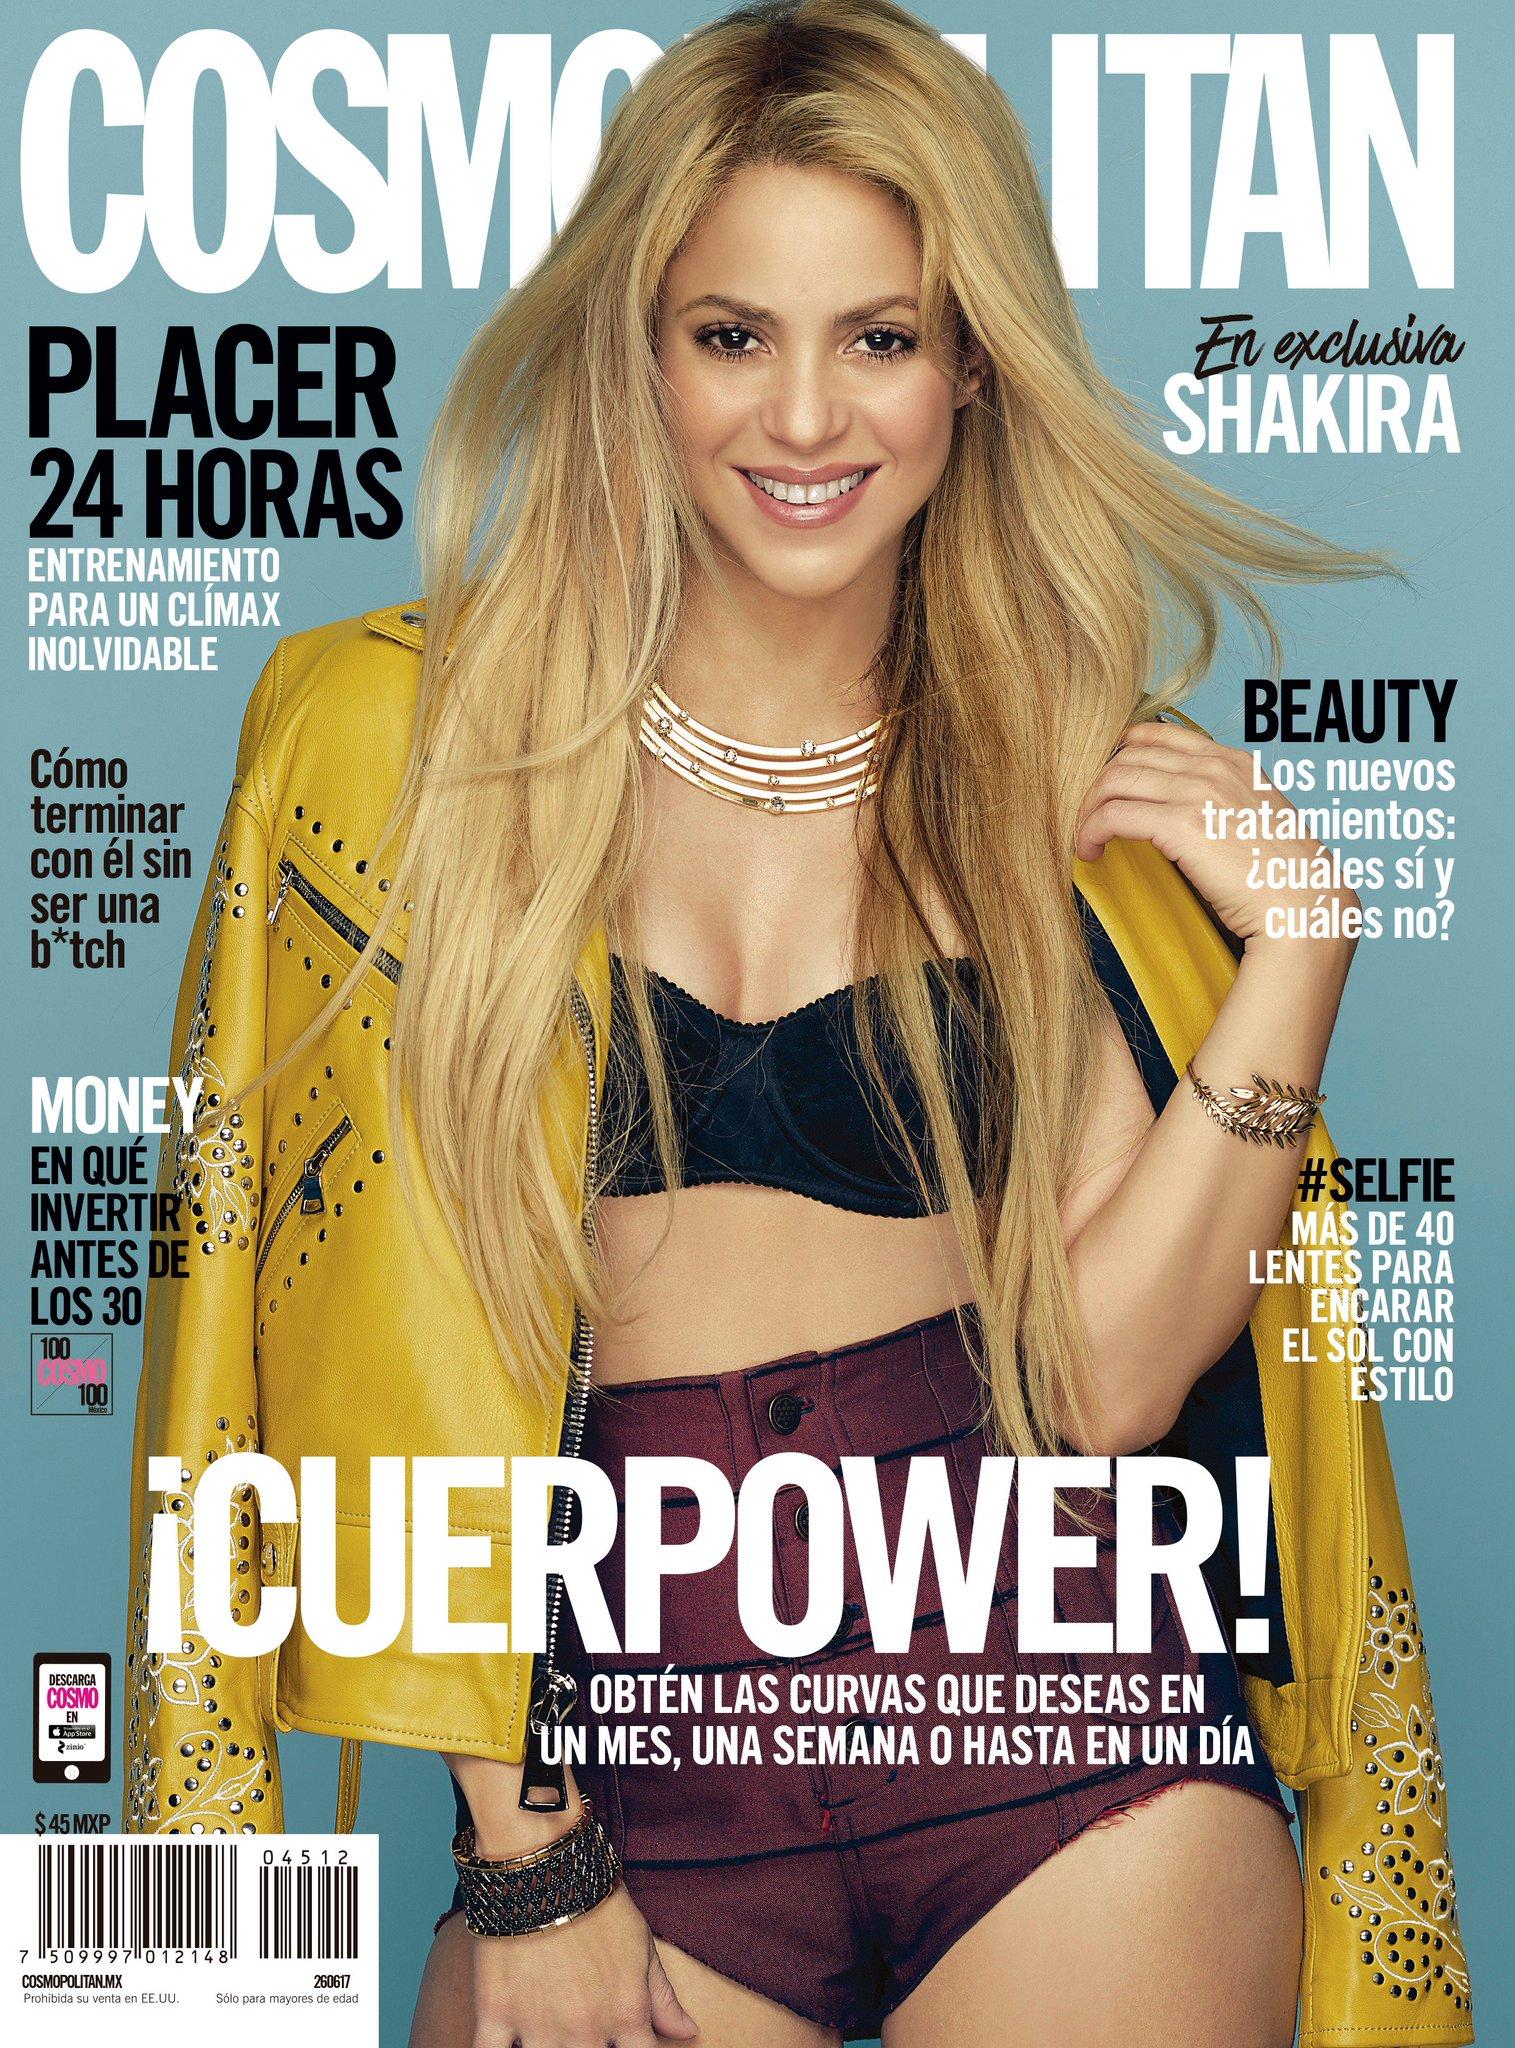 ¡Te revelamos nuestra nueva portada con la guapa @shakira ! ✨ ¡Corre por la tuya a partir de hoy! #ShakiraXCosmo https://t.co/owdhOrUA2r